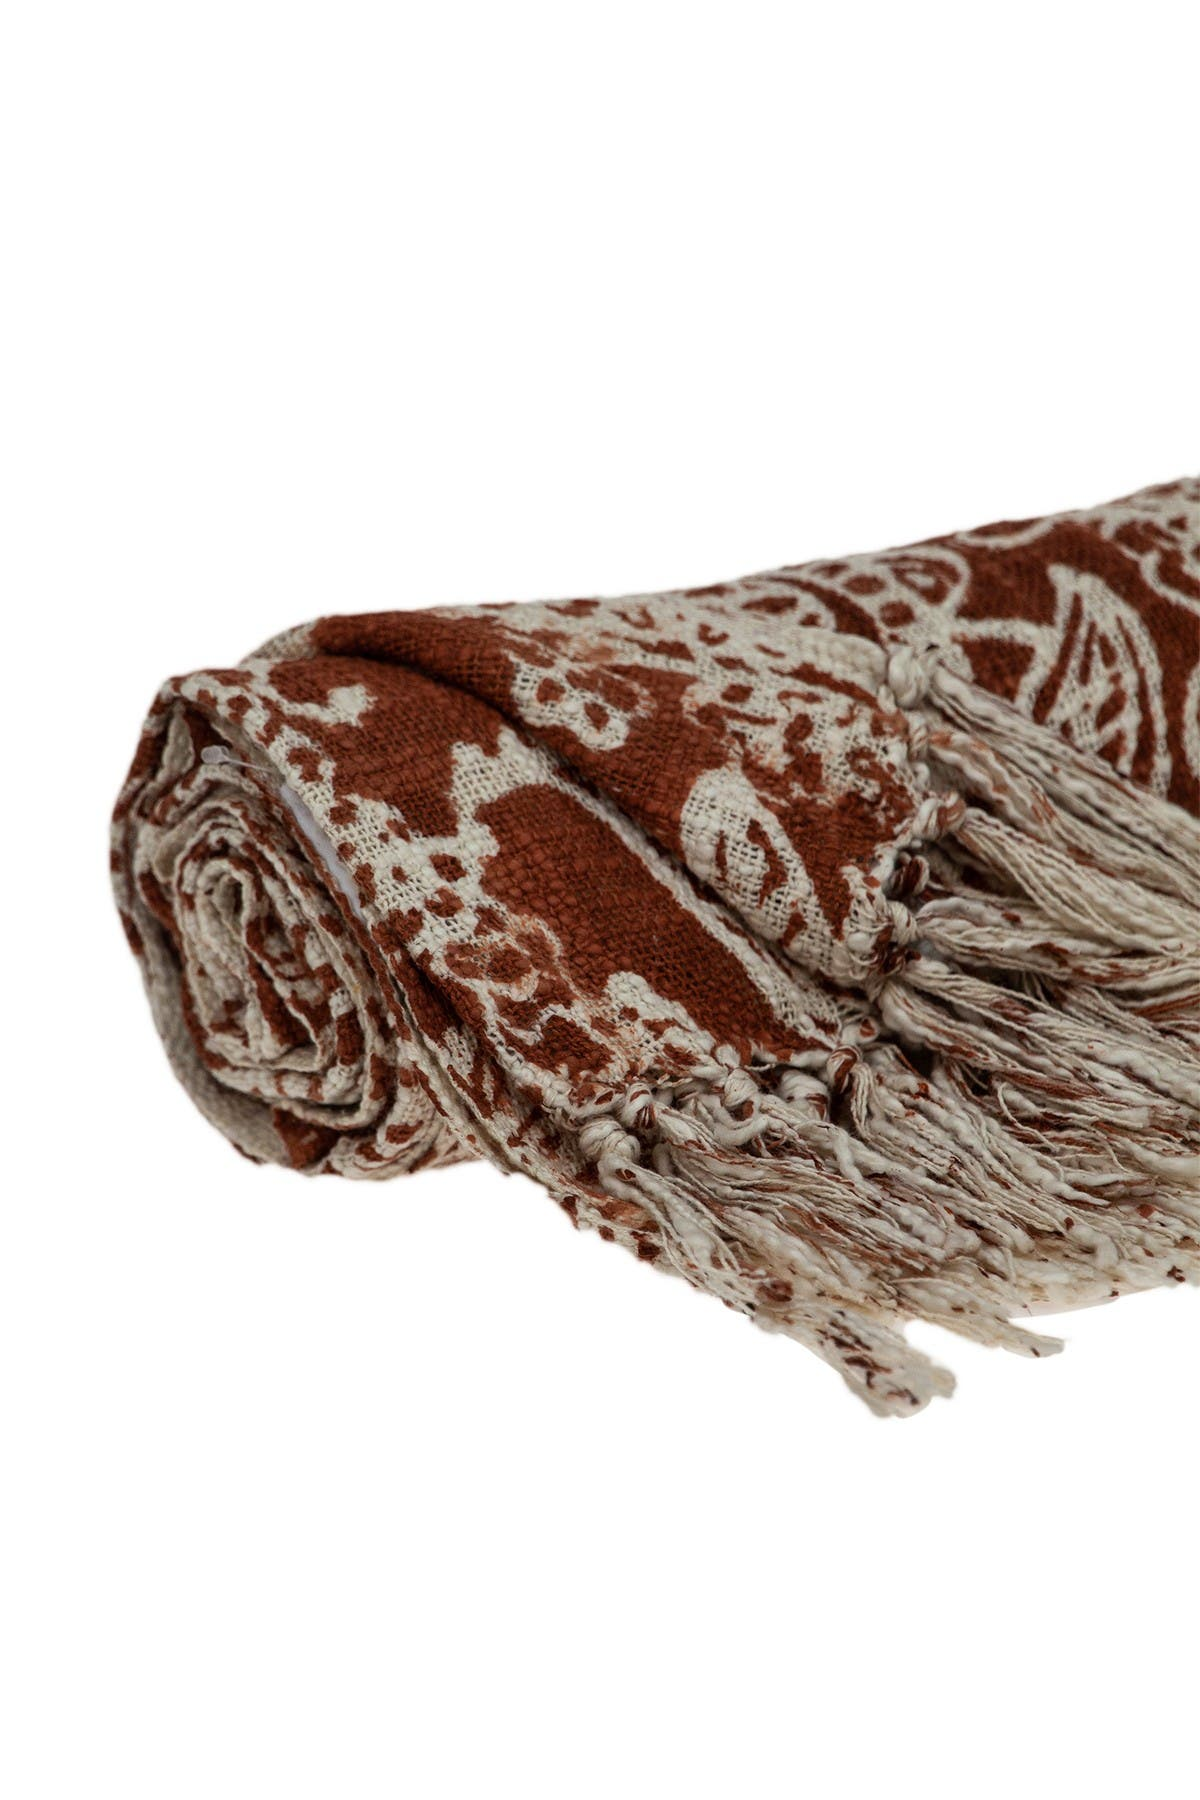 Parkland Collection Hina Floral Rust 52 X 67 Woven Handloom Throw Blanket Hautelook